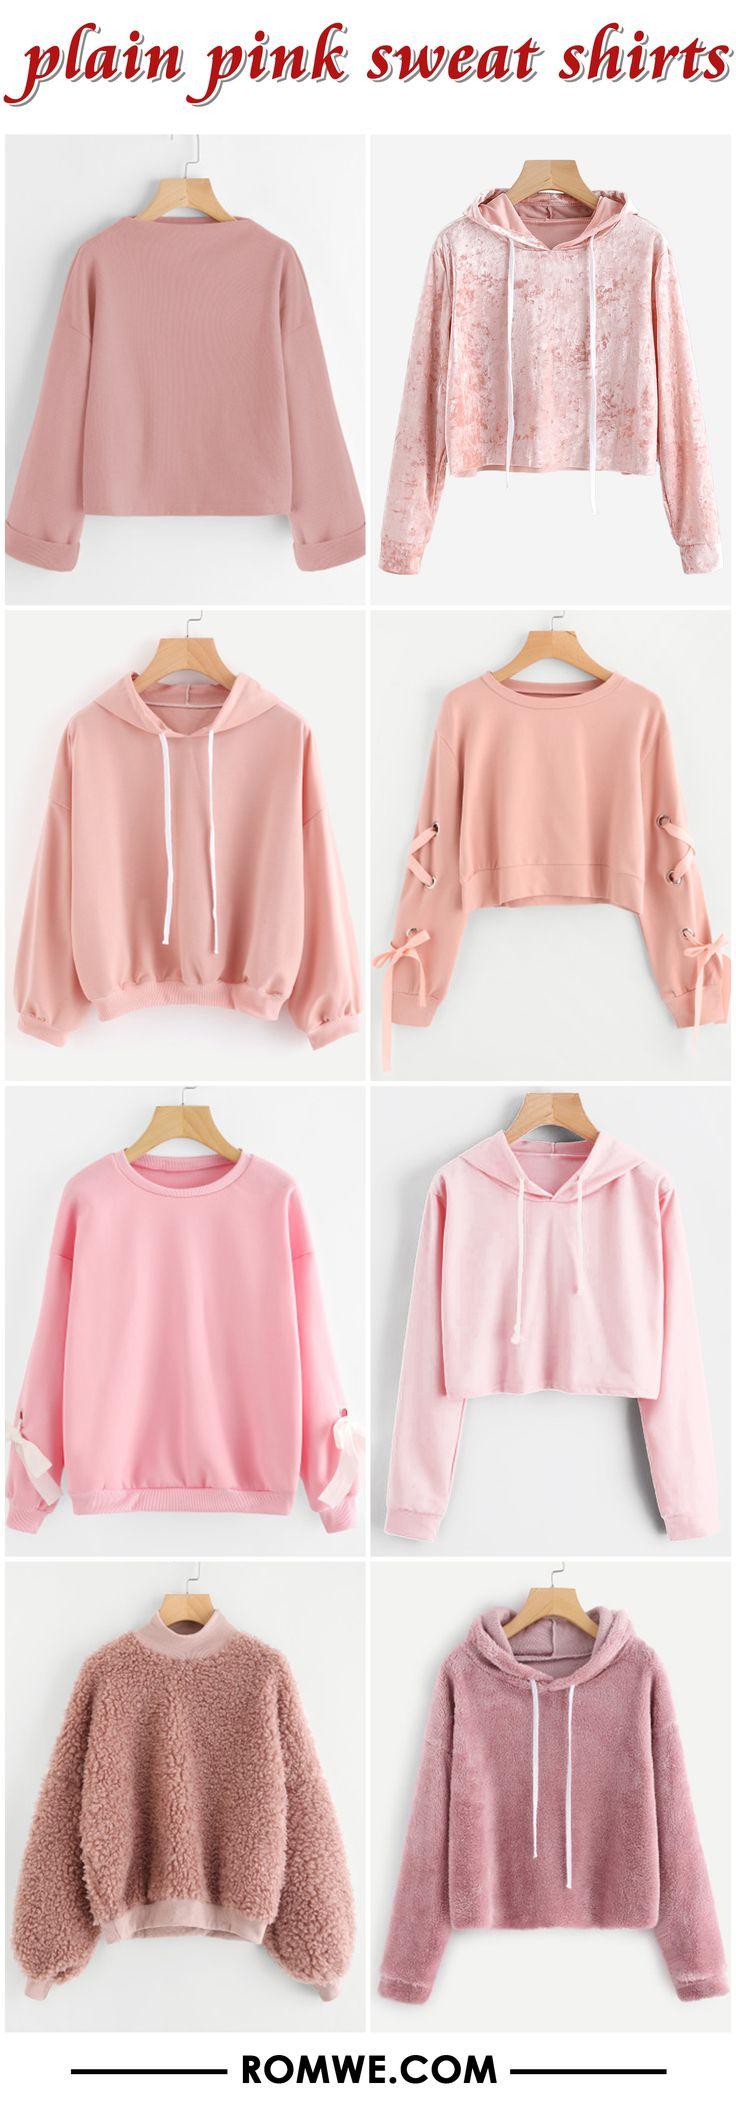 plain pink sweatshirts from romwe.com